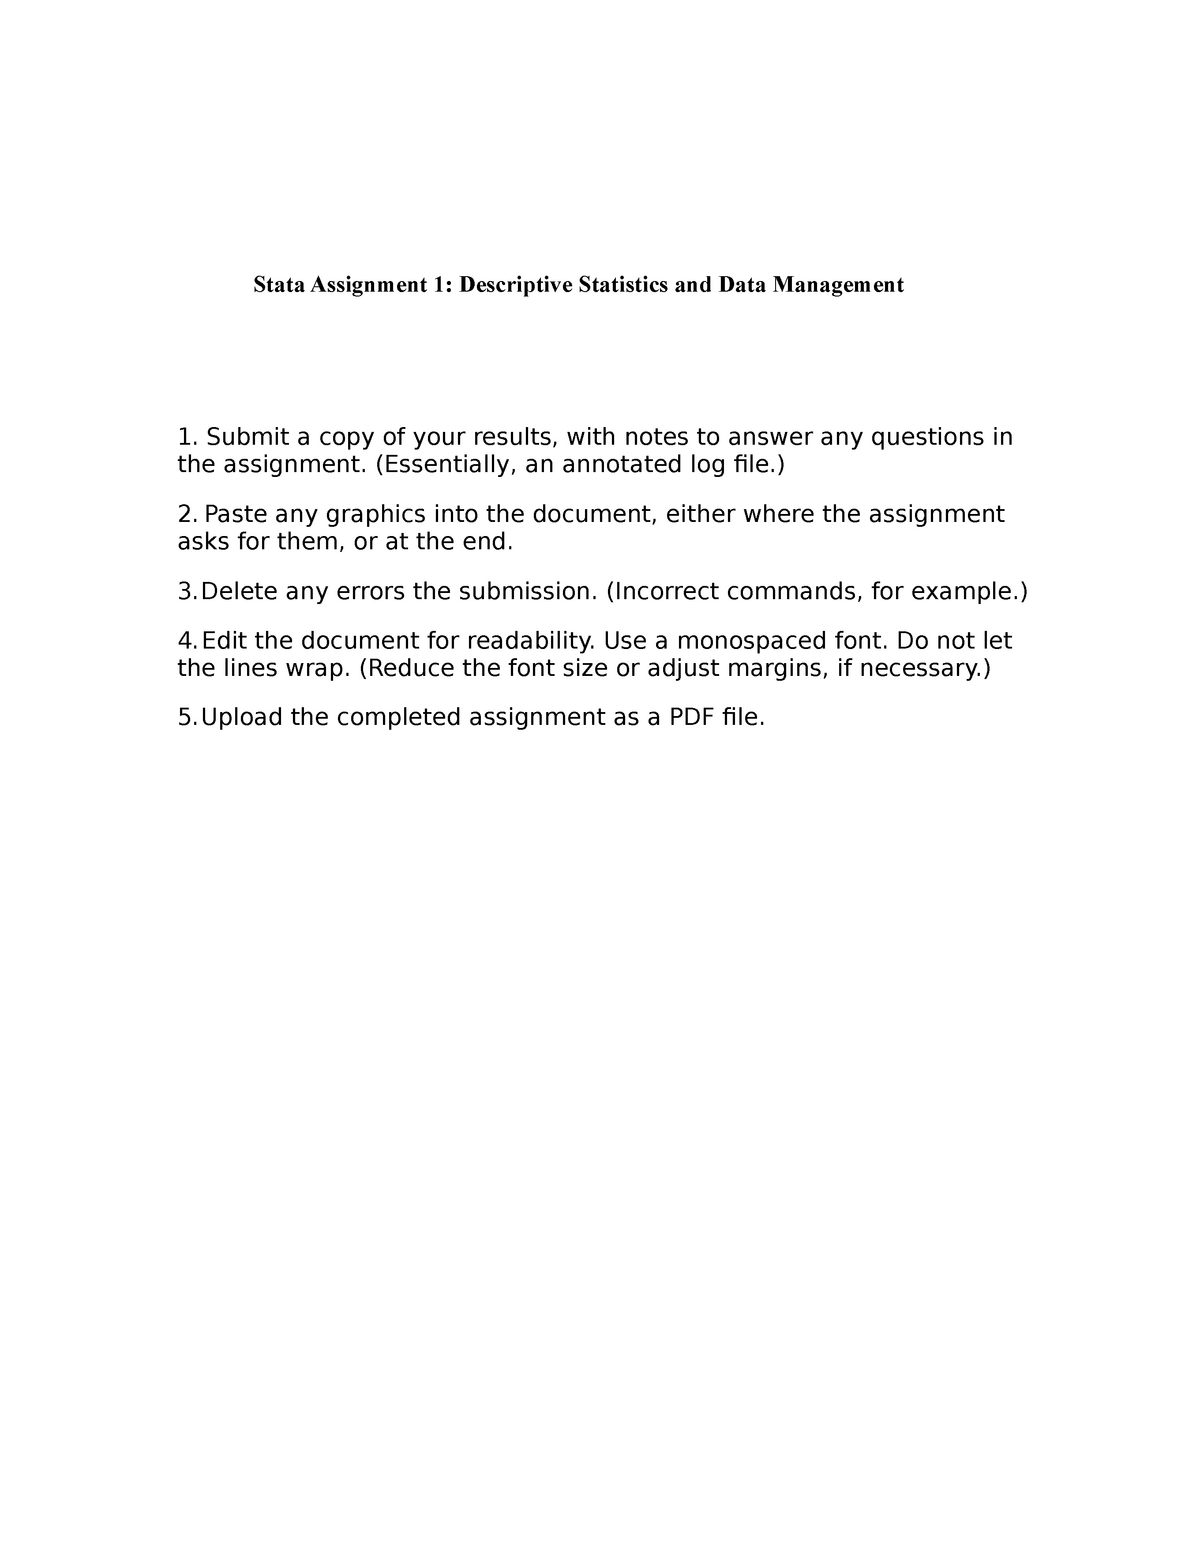 F17 Stata 1 - ECON 400: Elementary Statistics - StuDocu